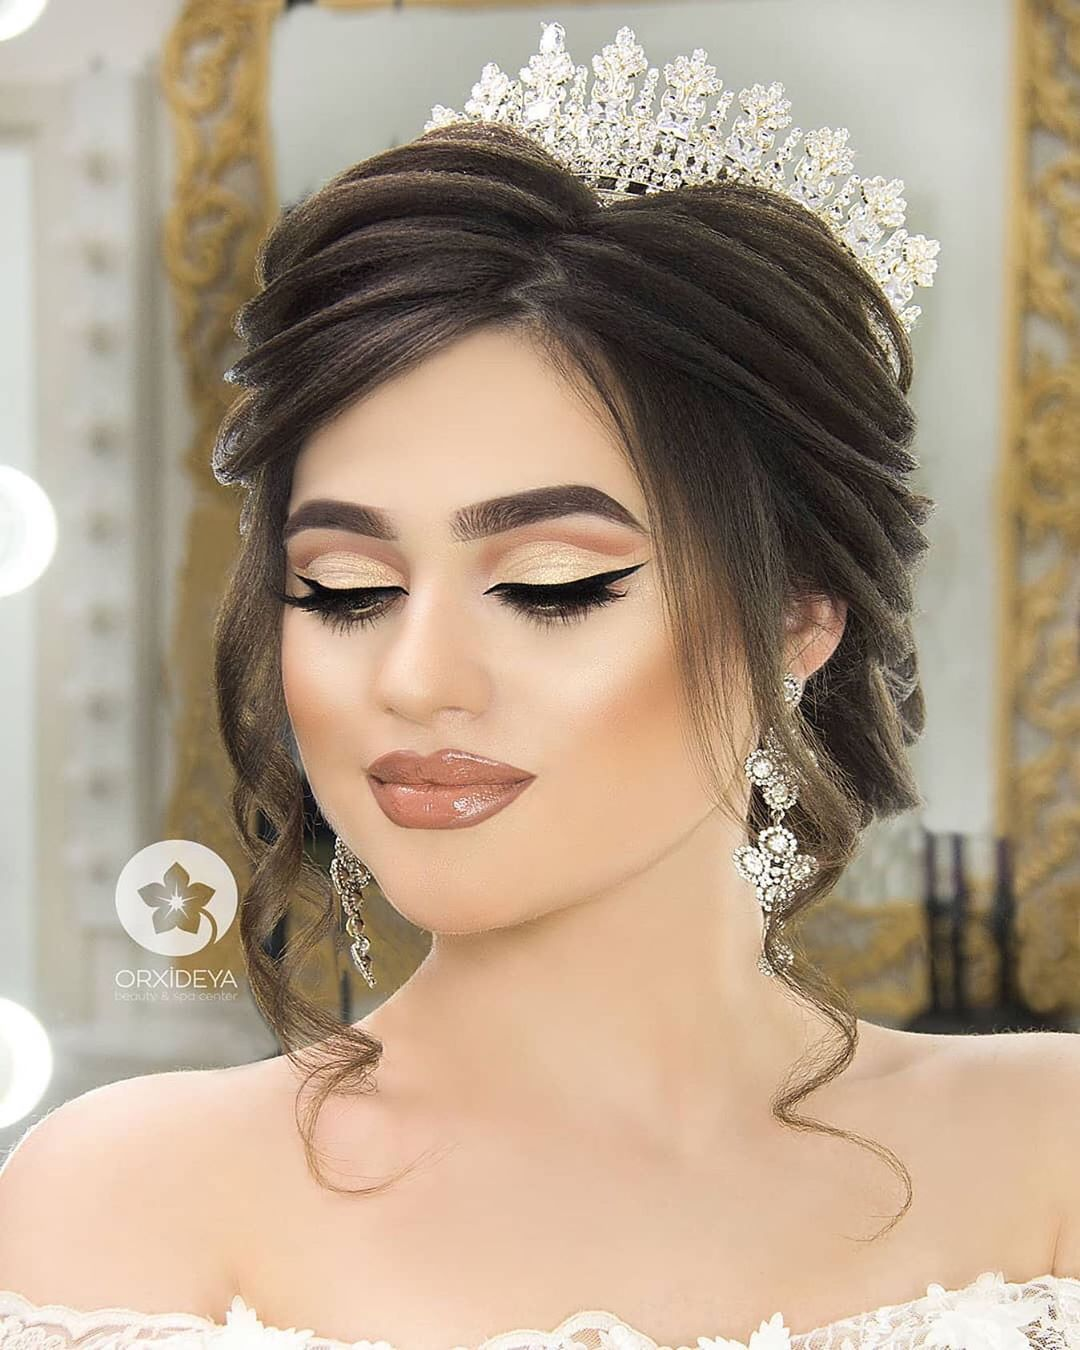 New The 10 Best Hairstyles Today With Pictures Sac Vizaj Yegane Prichyoska Vizazh Egana Hairstyle Makeup Yegane Yeganenur Orx Dugun Makyaji Sac Dugun